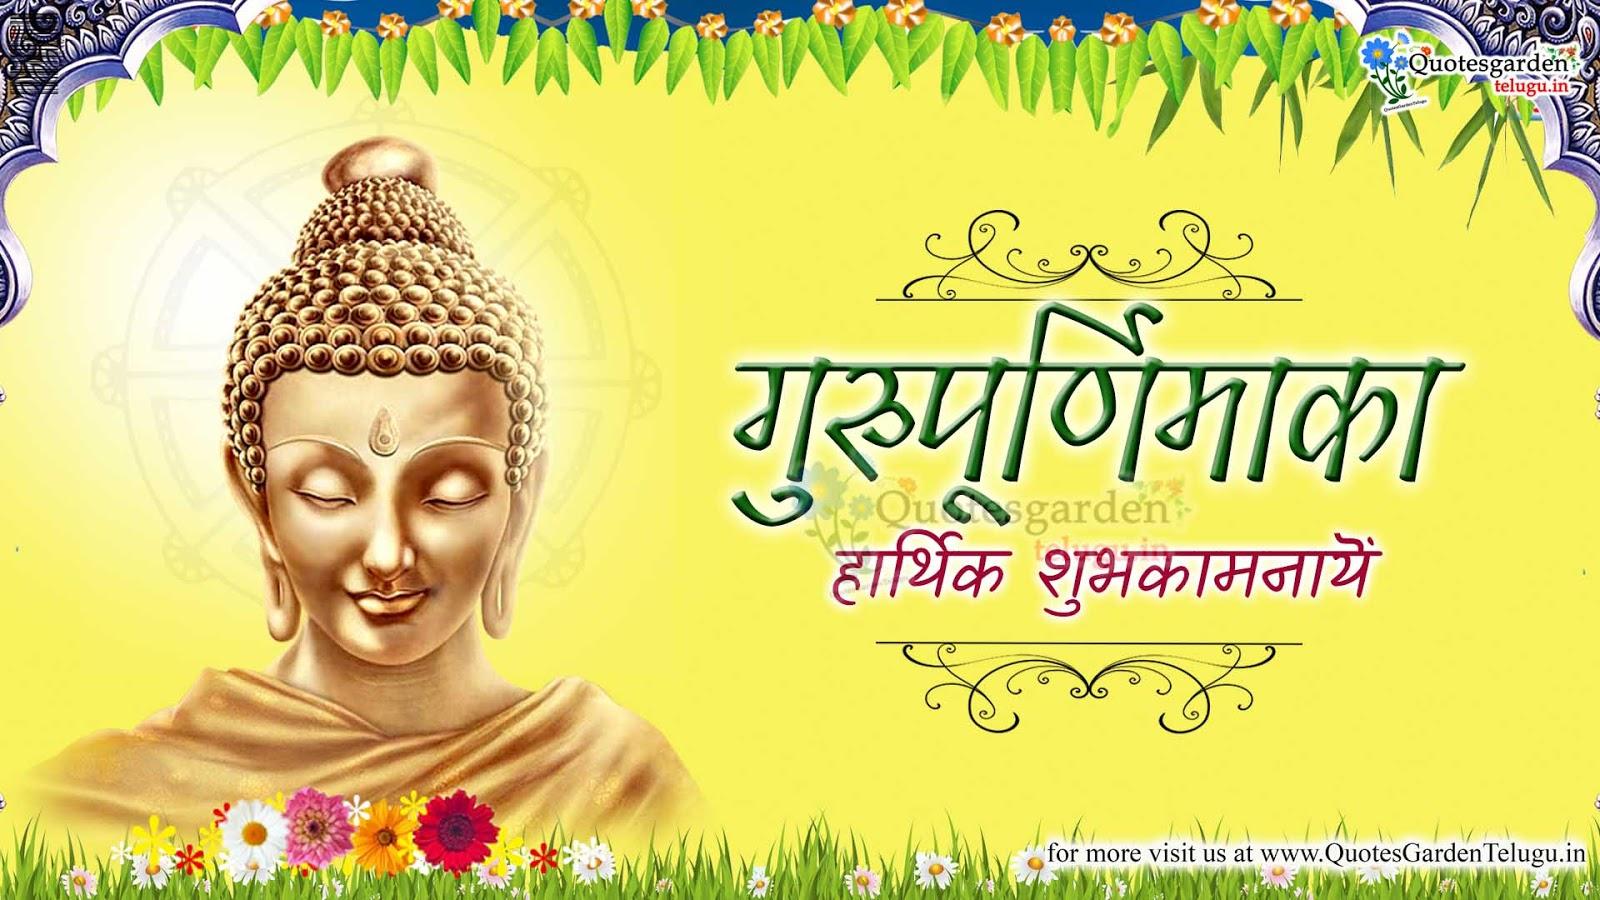 Guru Purnima Wishes Quotes In Hindi Marathi: Happy Guru Purnima Greetings Wishes In Hindi